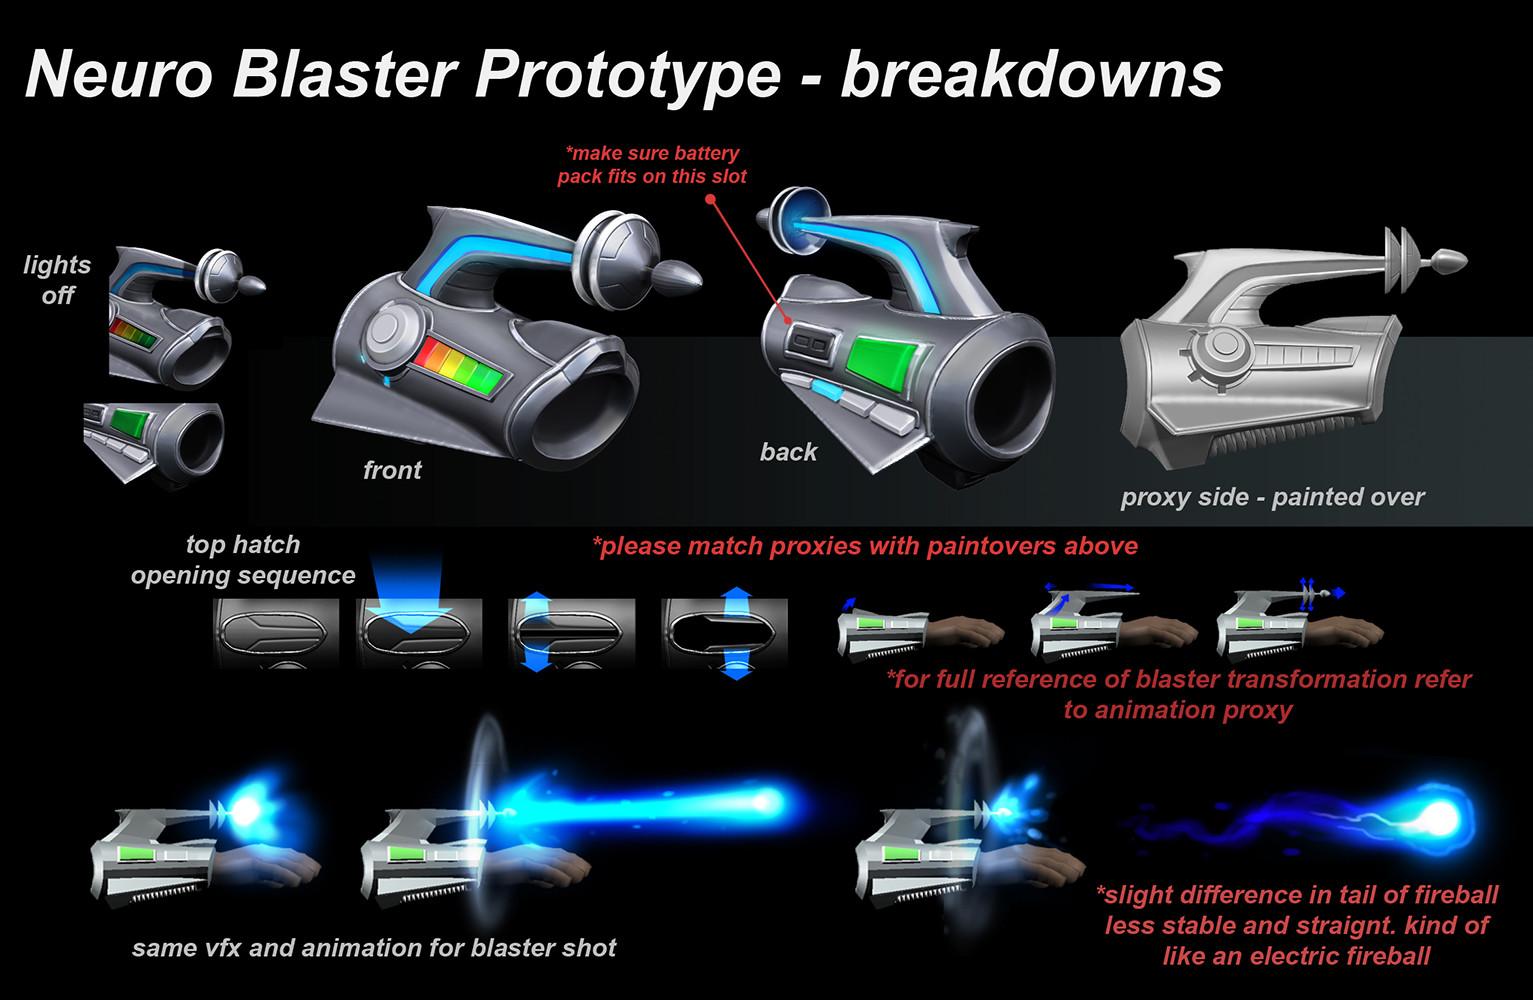 Jose cua neuro blaster prototype breakdowns